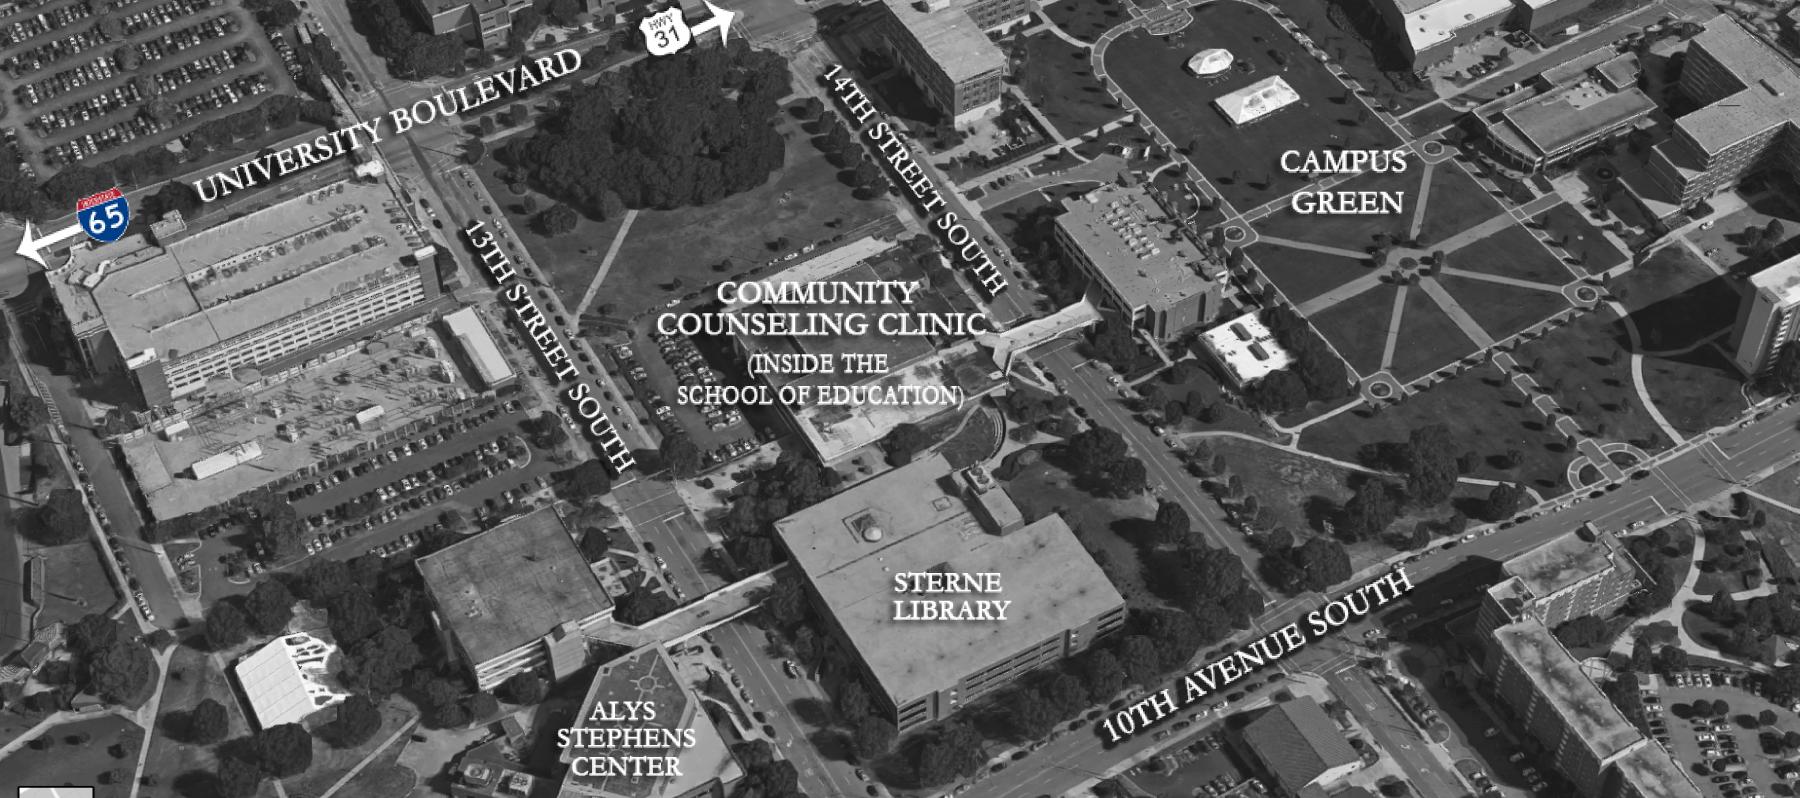 Uab education building